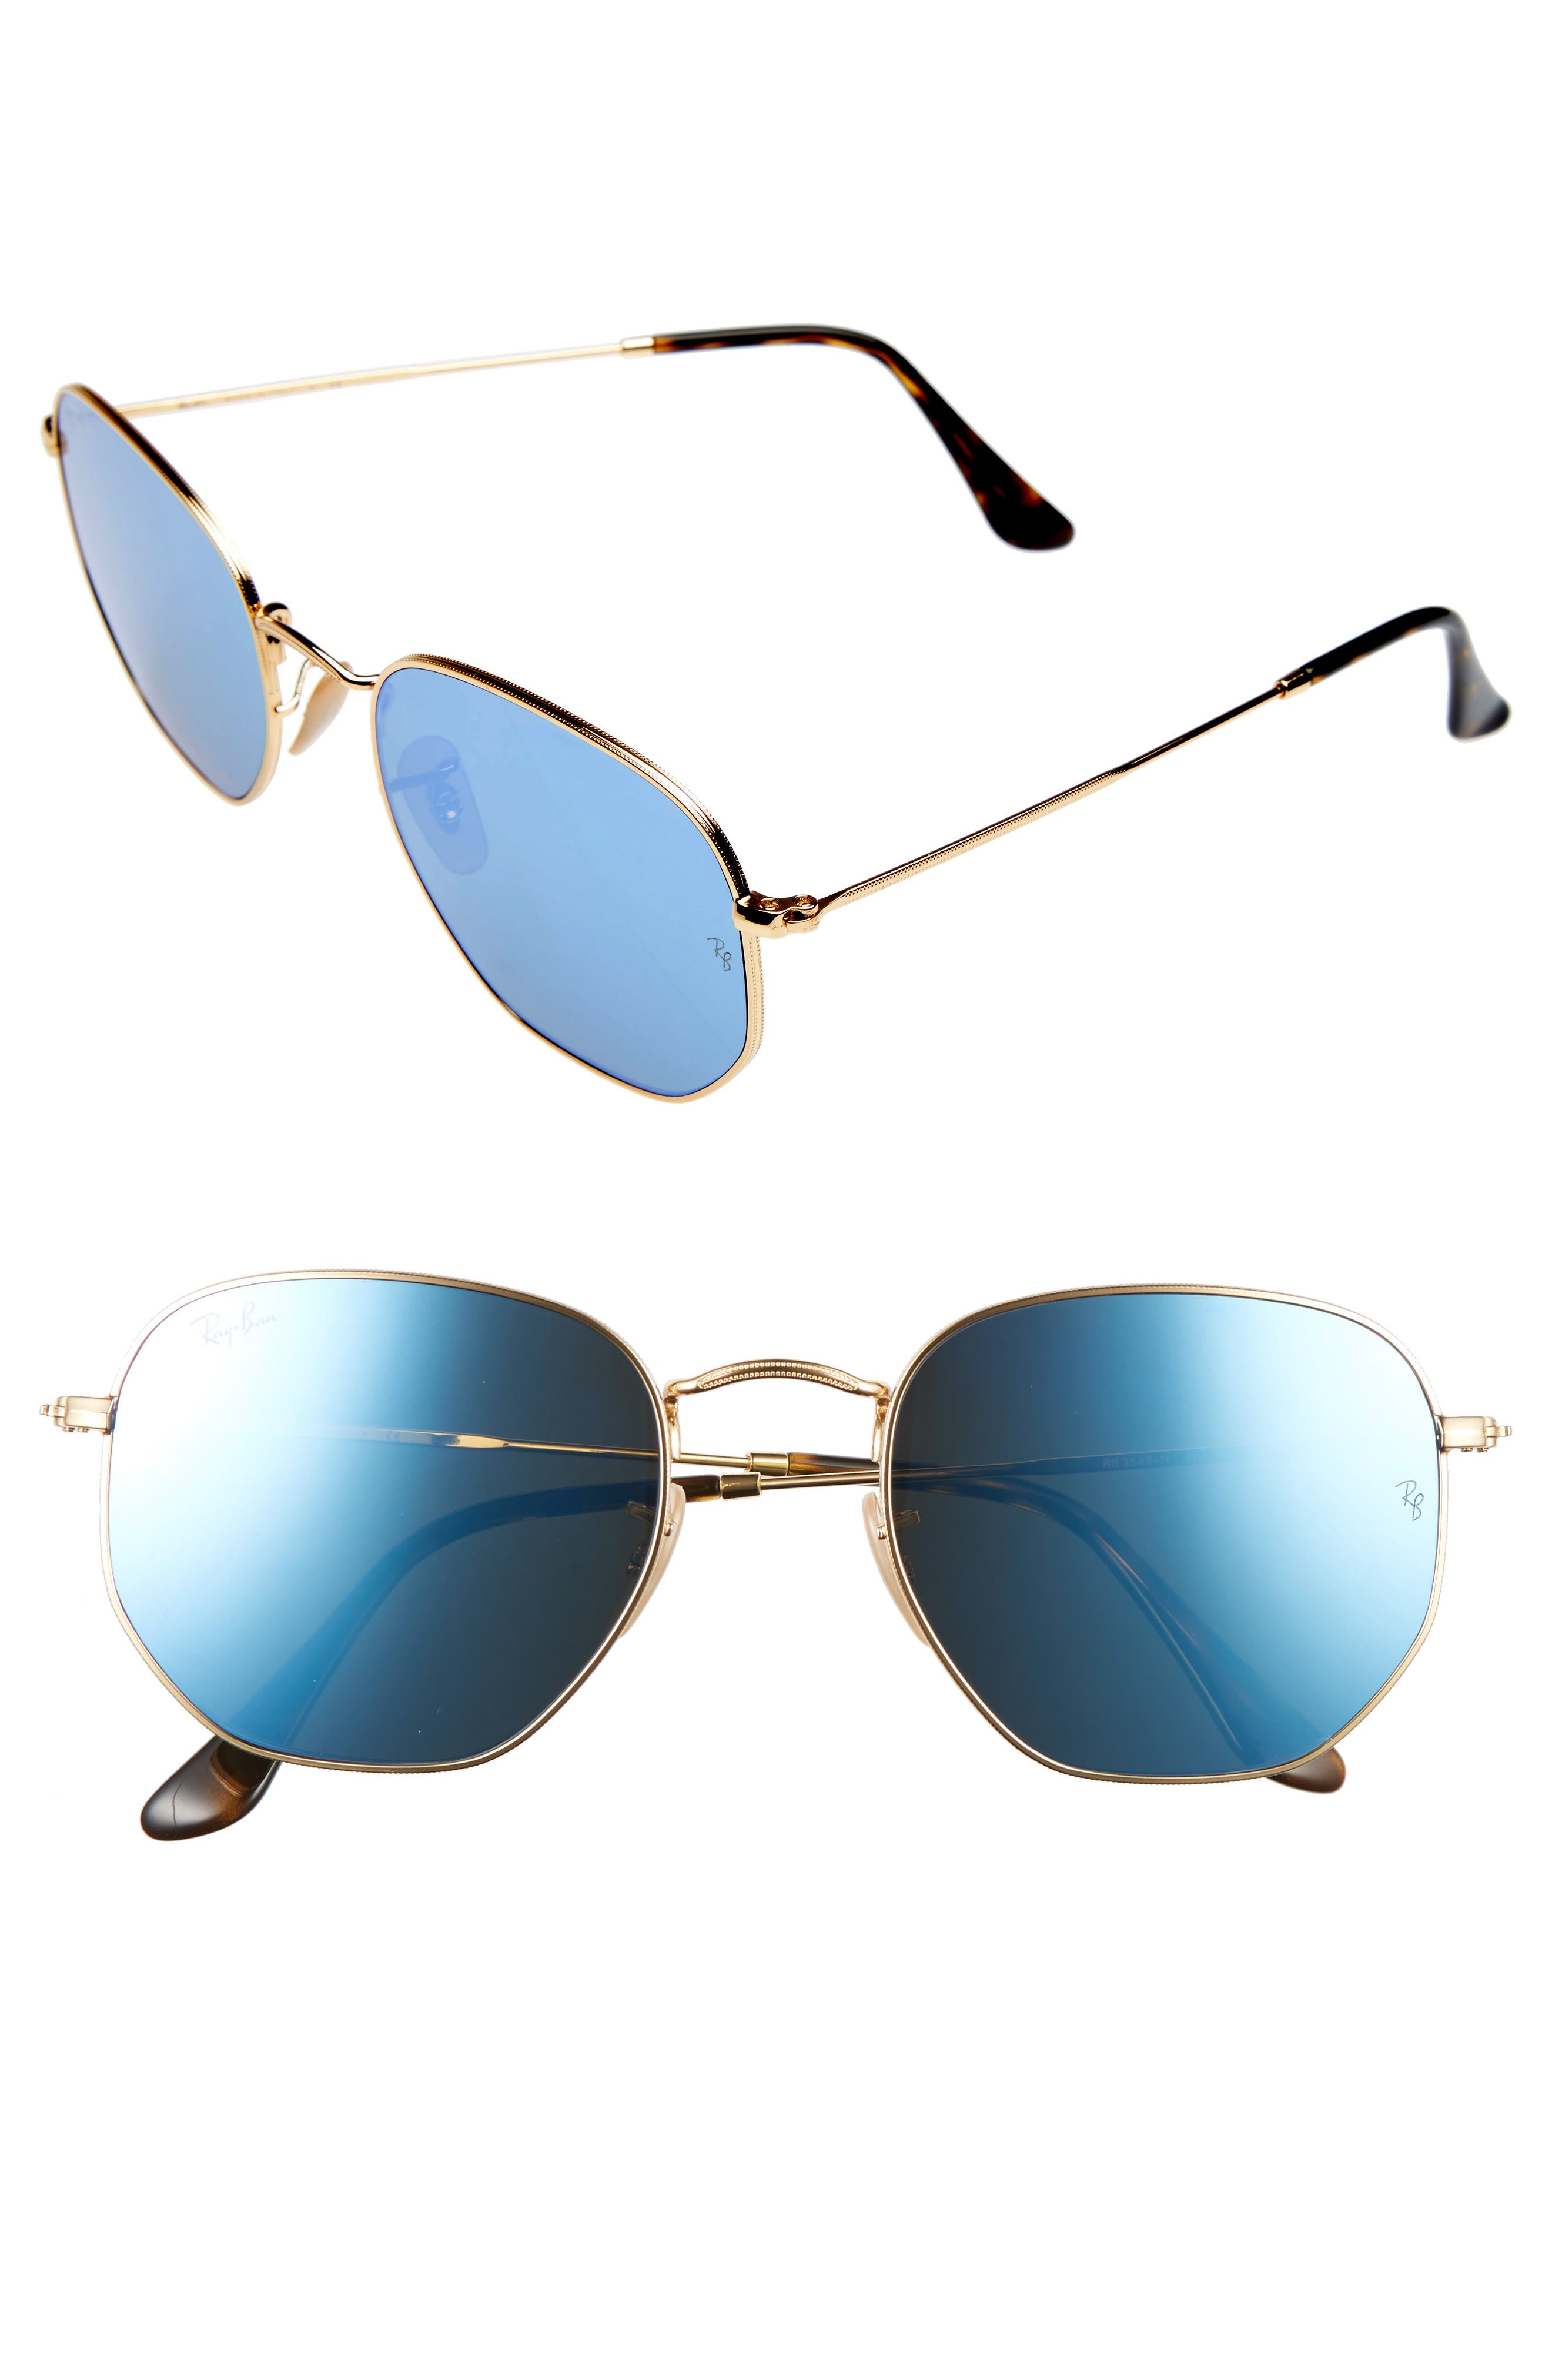 54mm Hexagonal Flat Lens Sunglasses,                             Main thumbnail 1, color,                             708